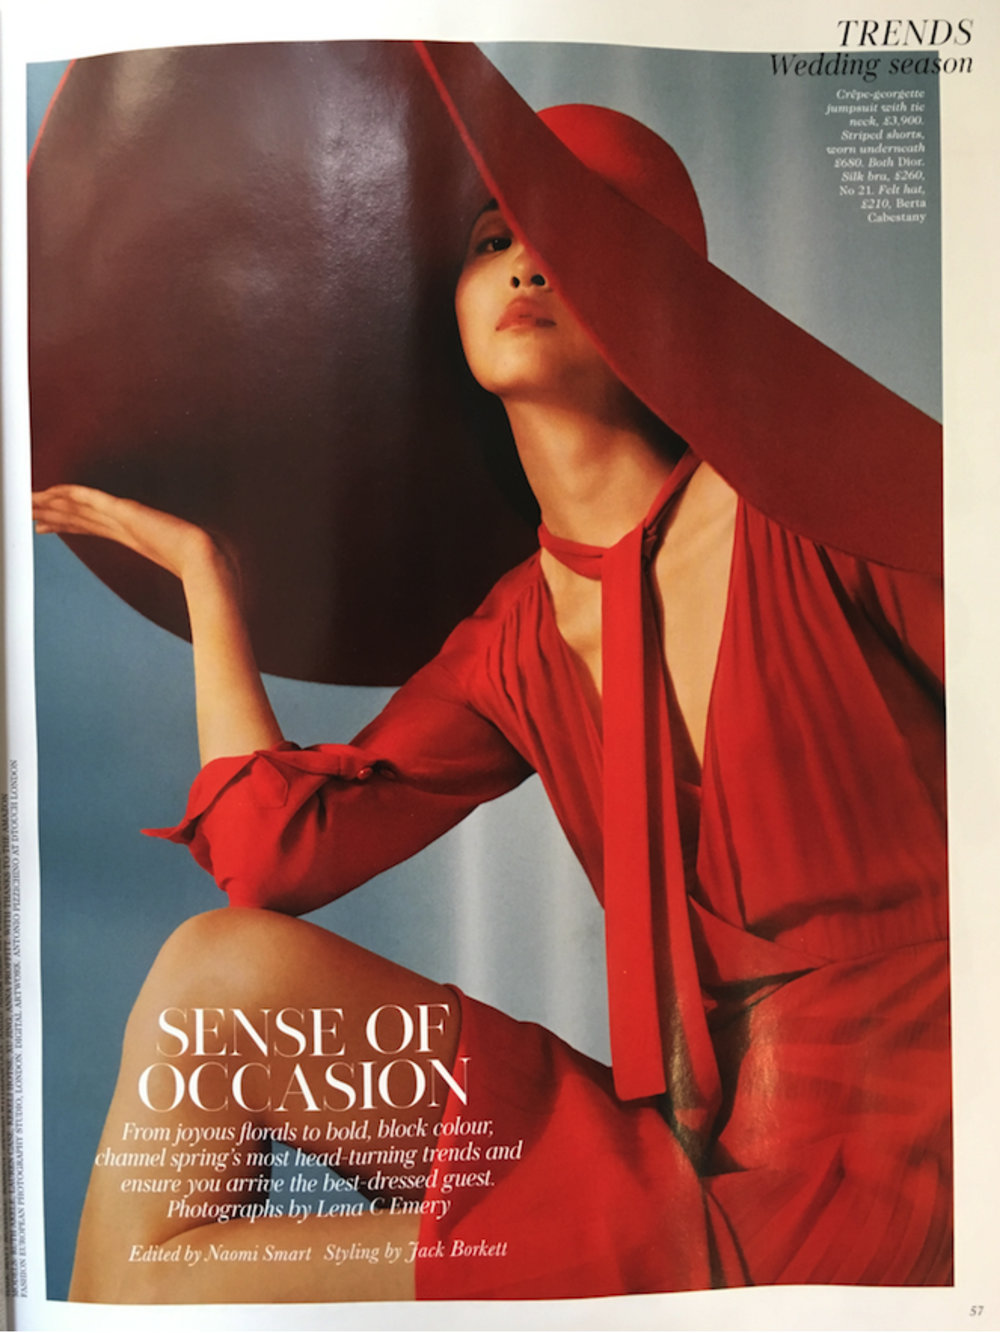 180404 - Berta Cabestany - Vogue - 4 April.jpg